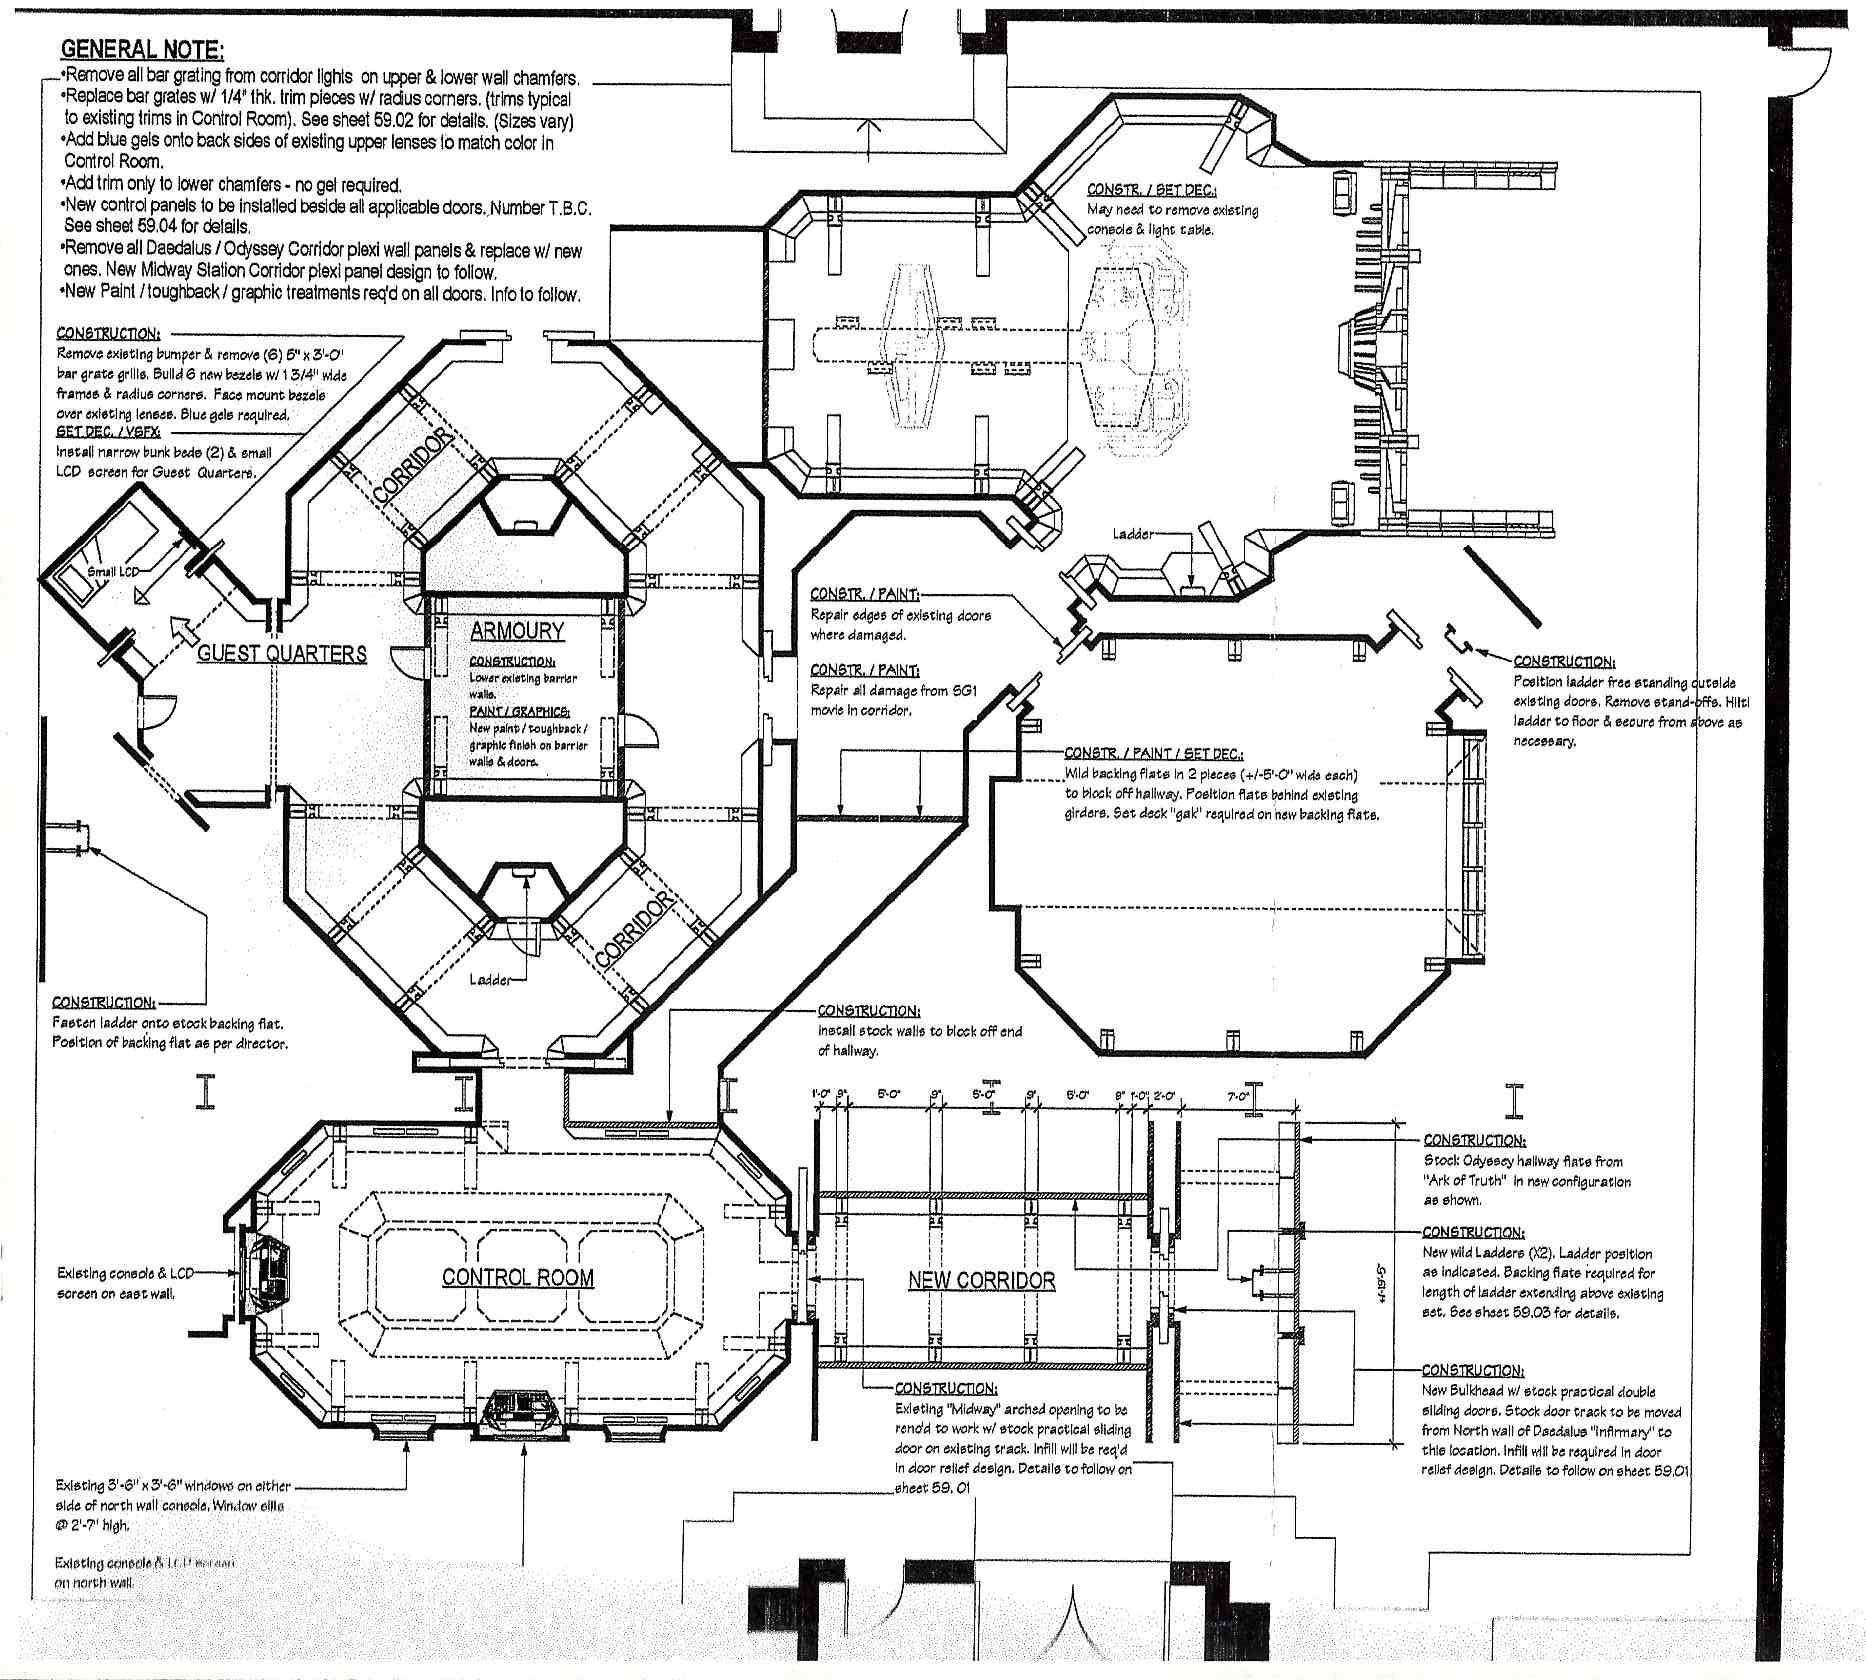 Forum Stargate Fusion Gt Blog De Mallozzi News